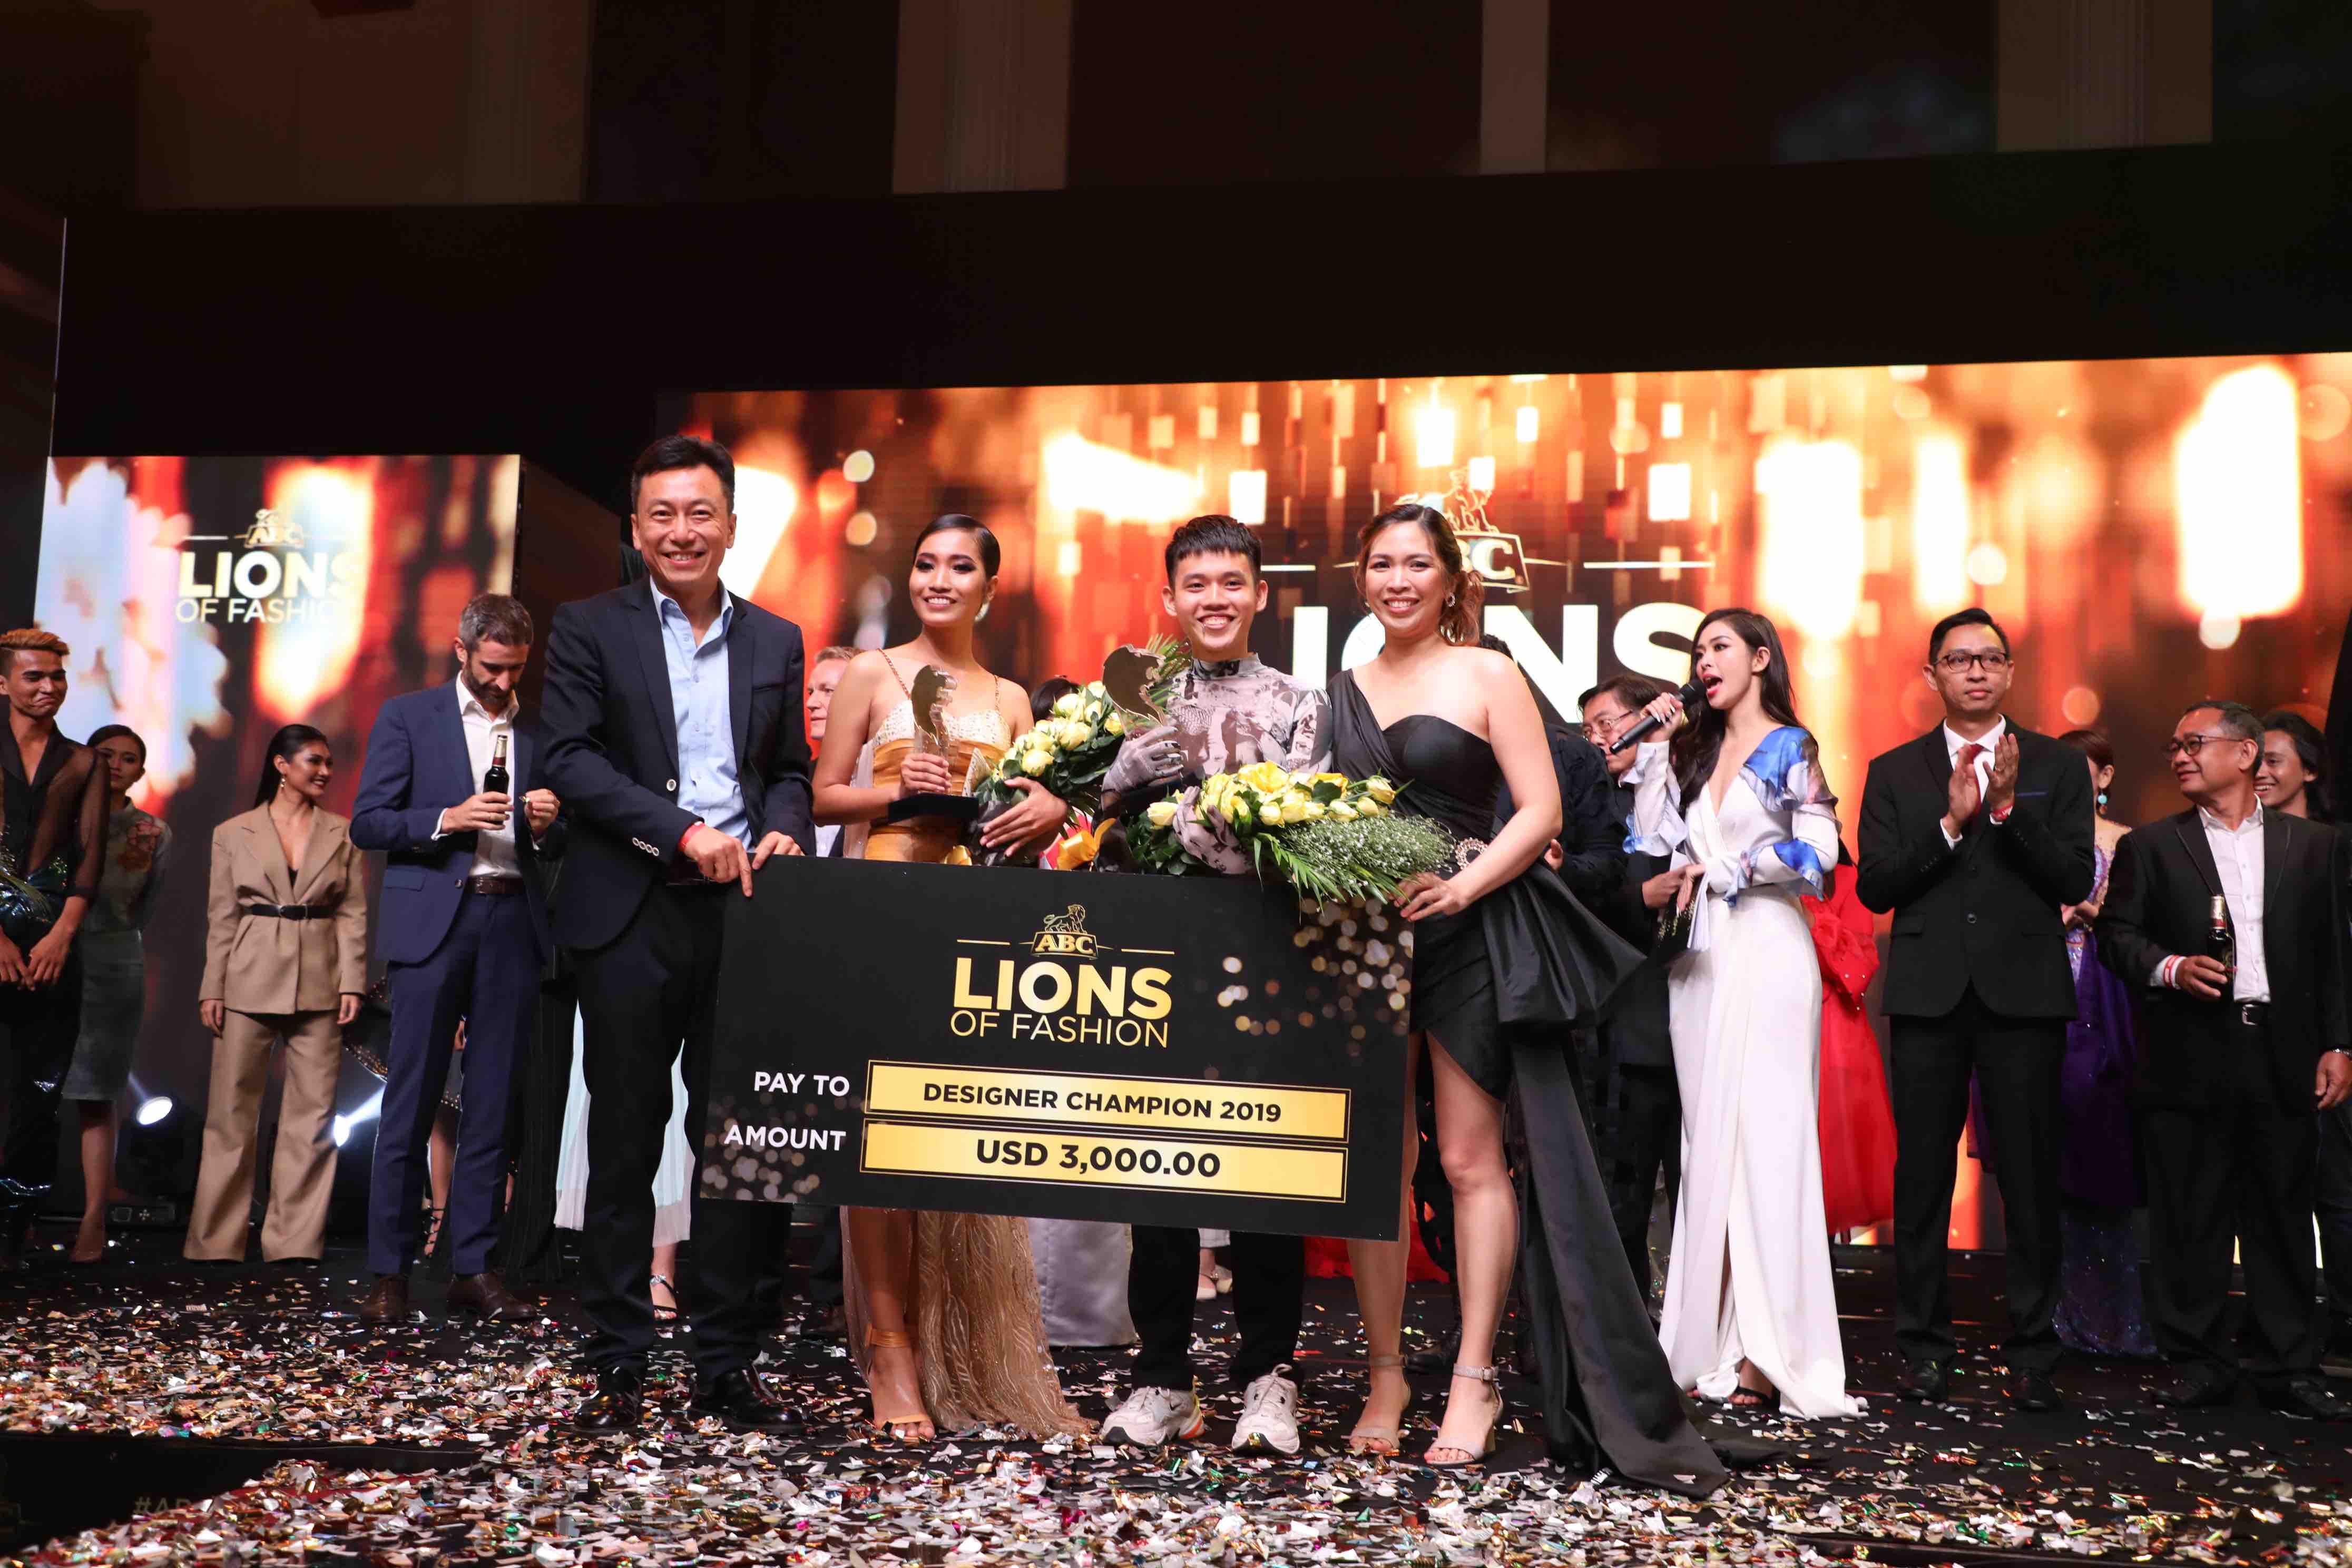 ABC Lions of Fashion